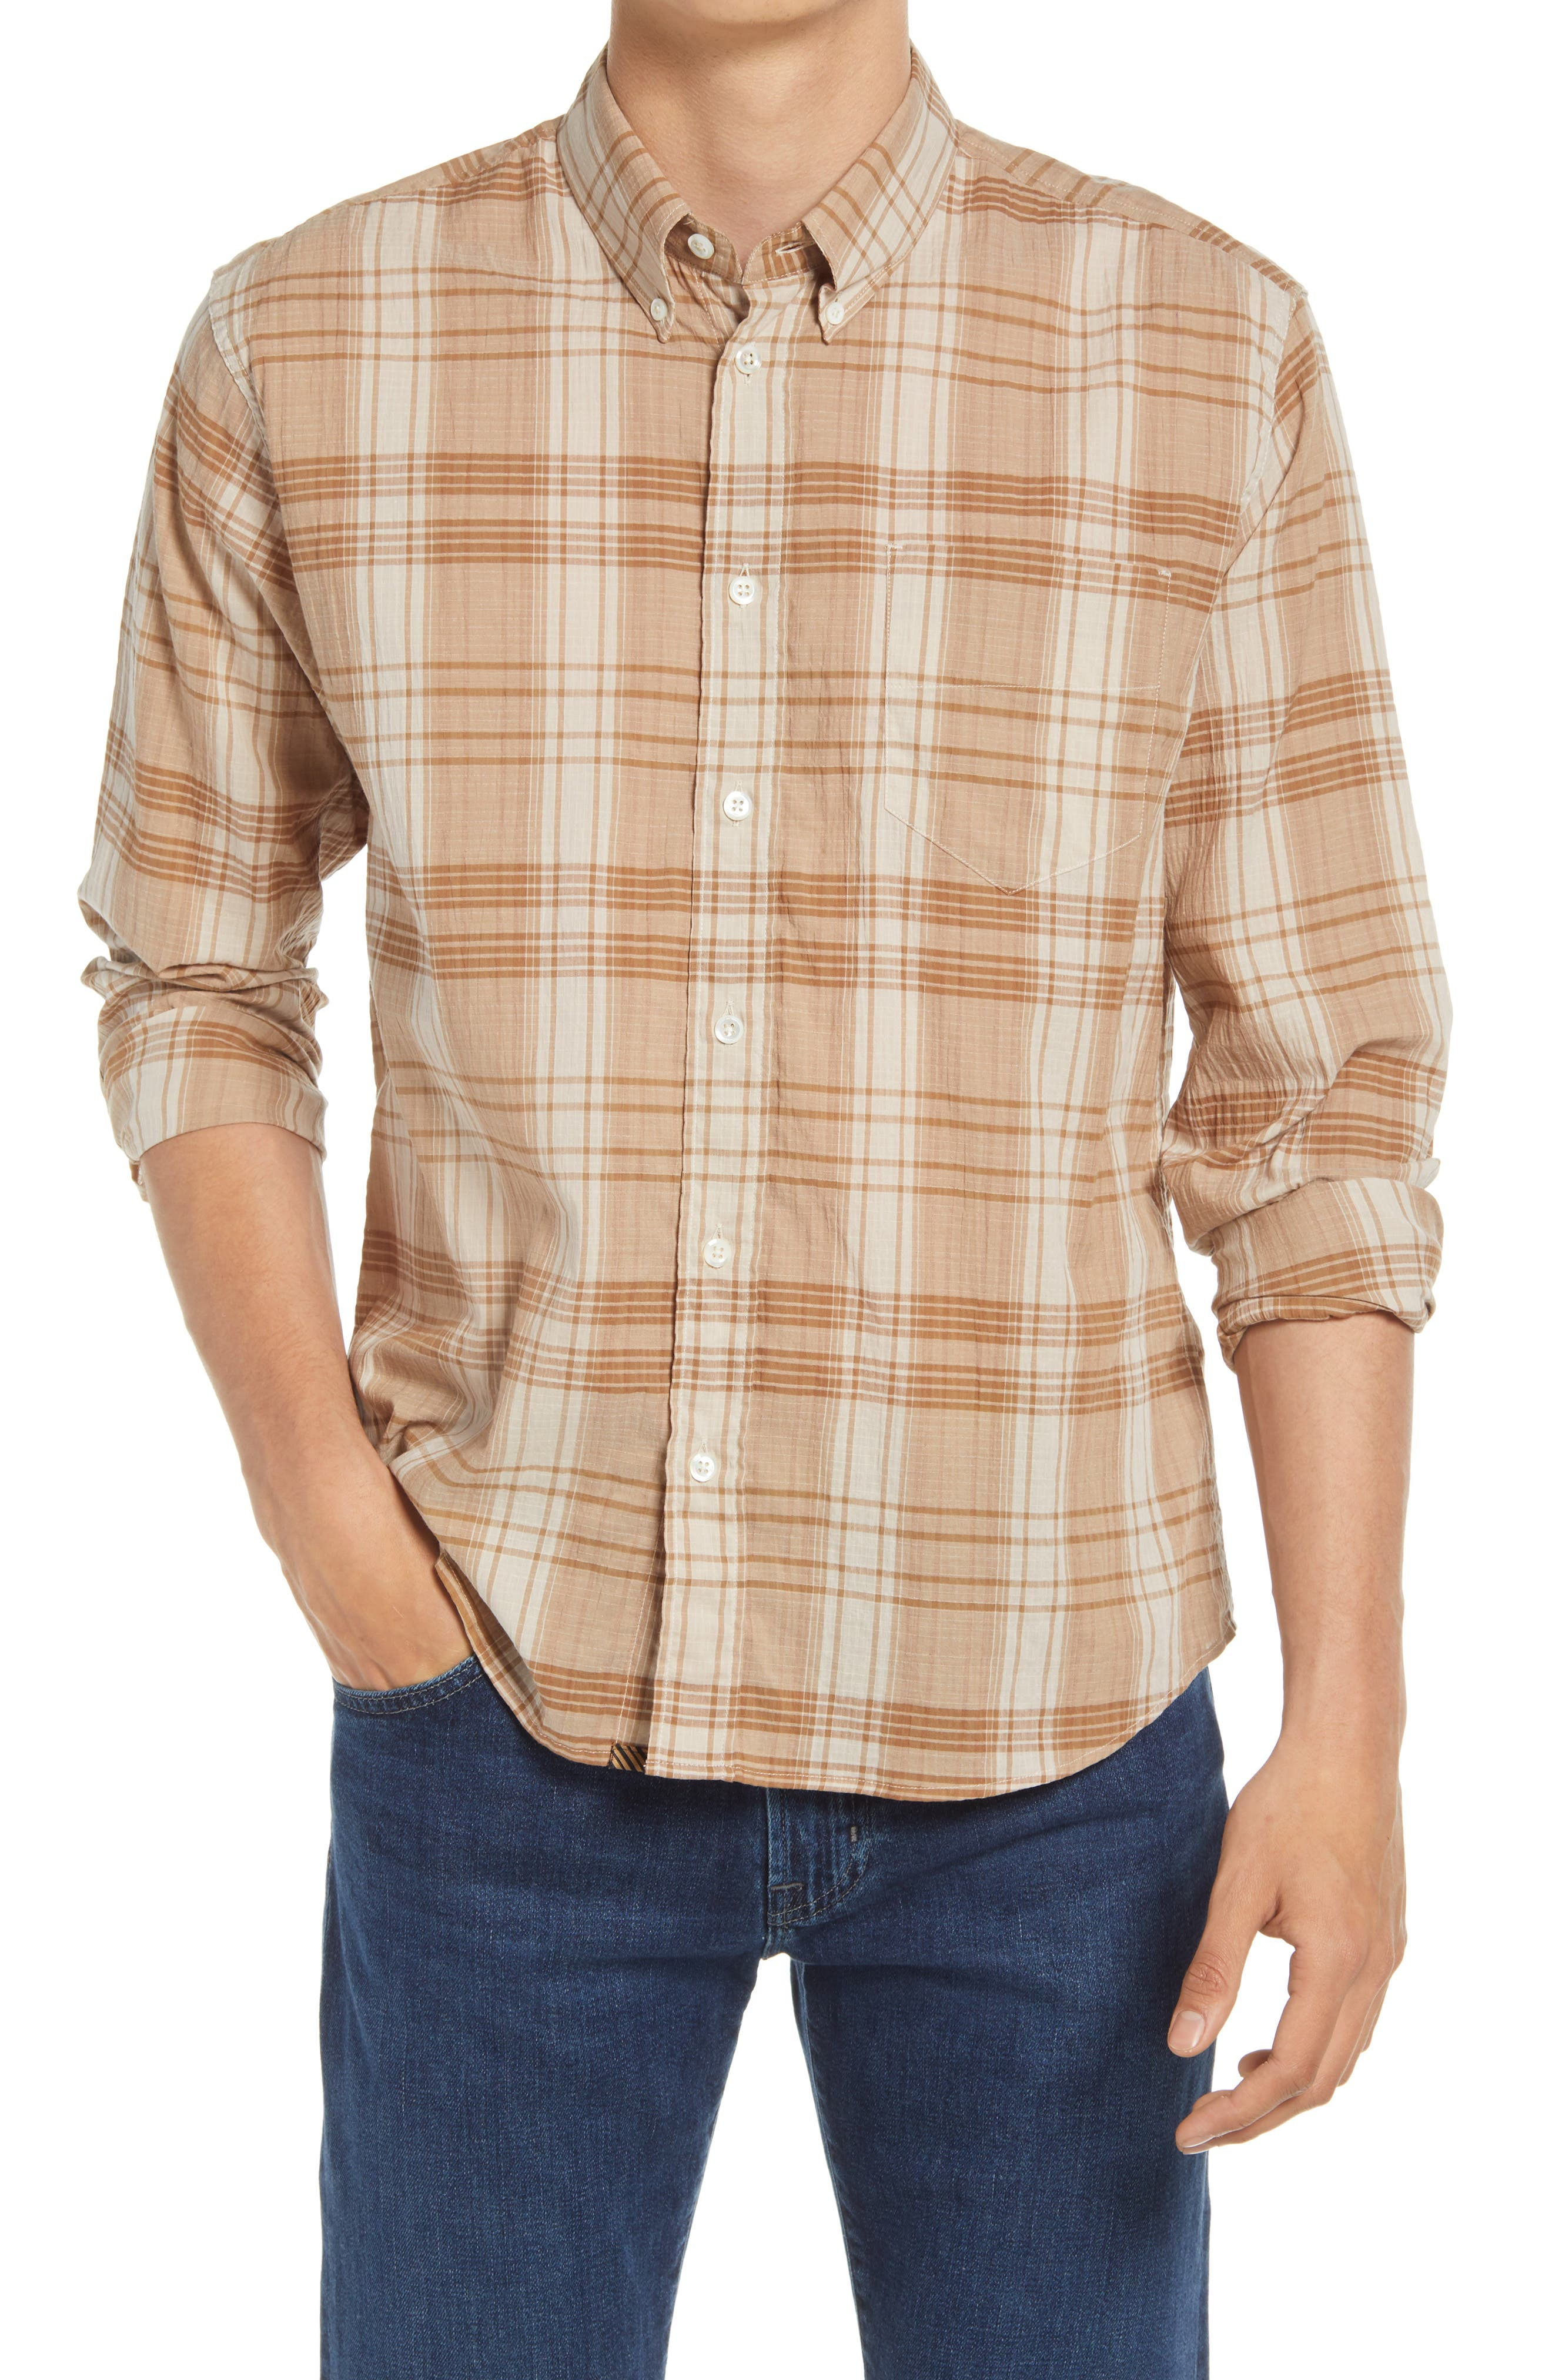 Offset Pocket Check Button-Down Shirt